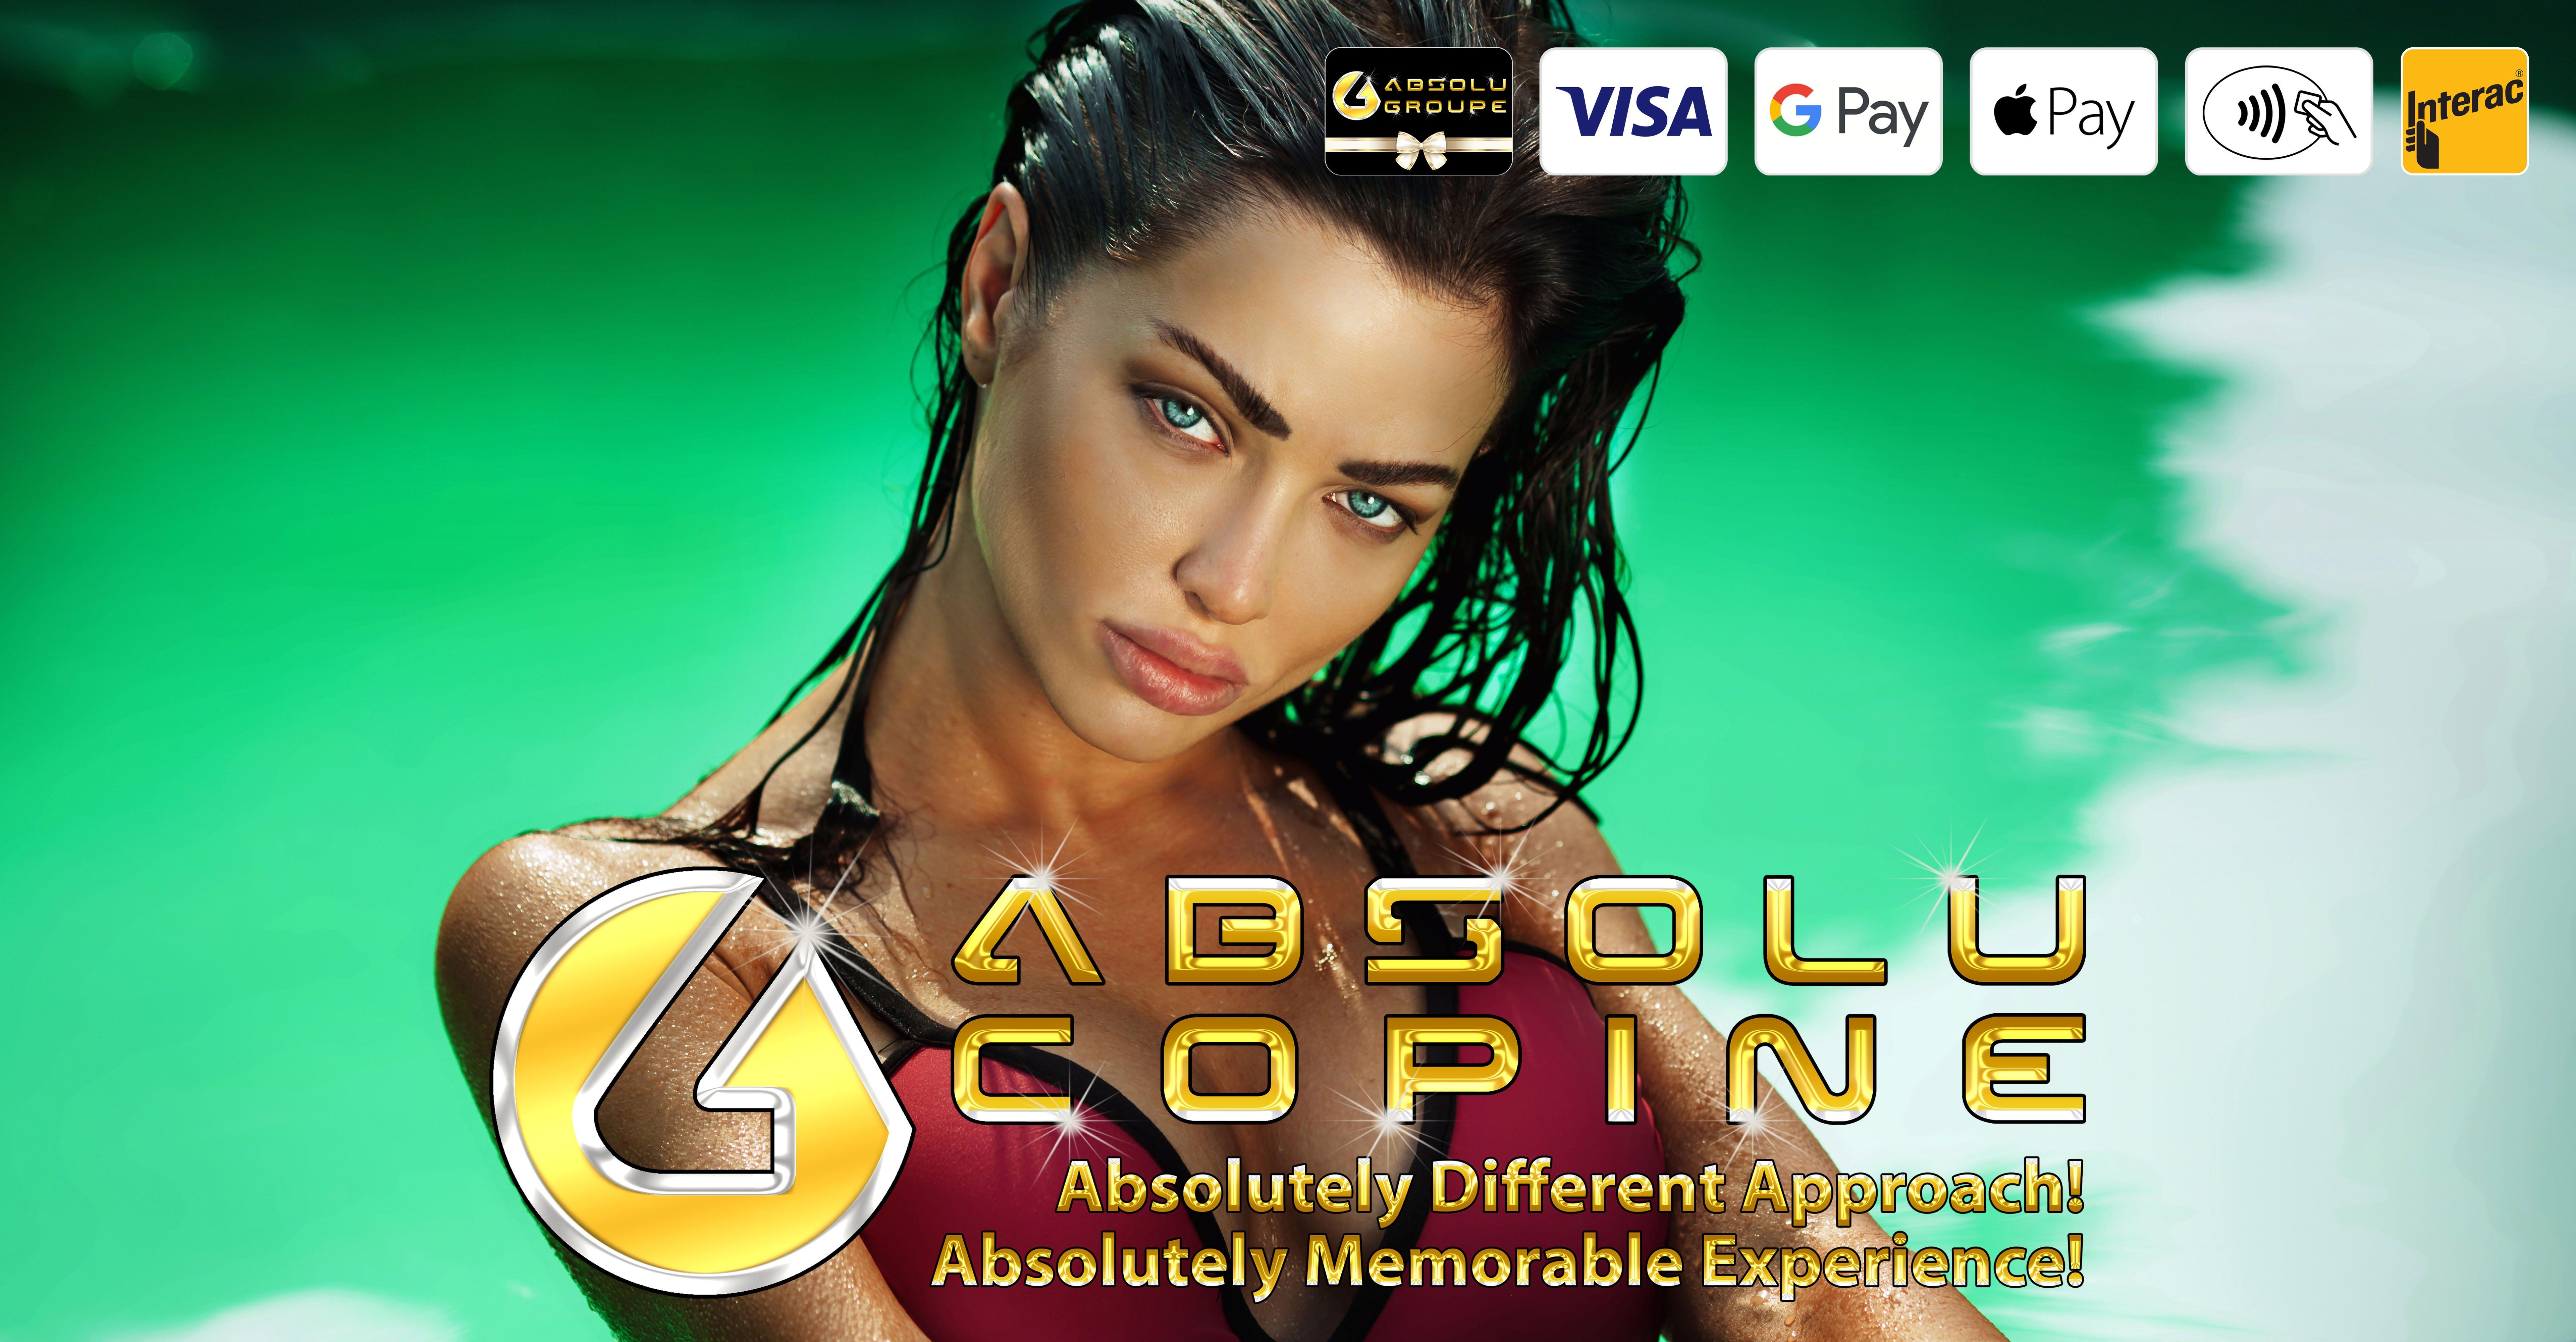 All-Our-Girlfriends-Absolu-Copine-Escorts-Montreal-EN-8K